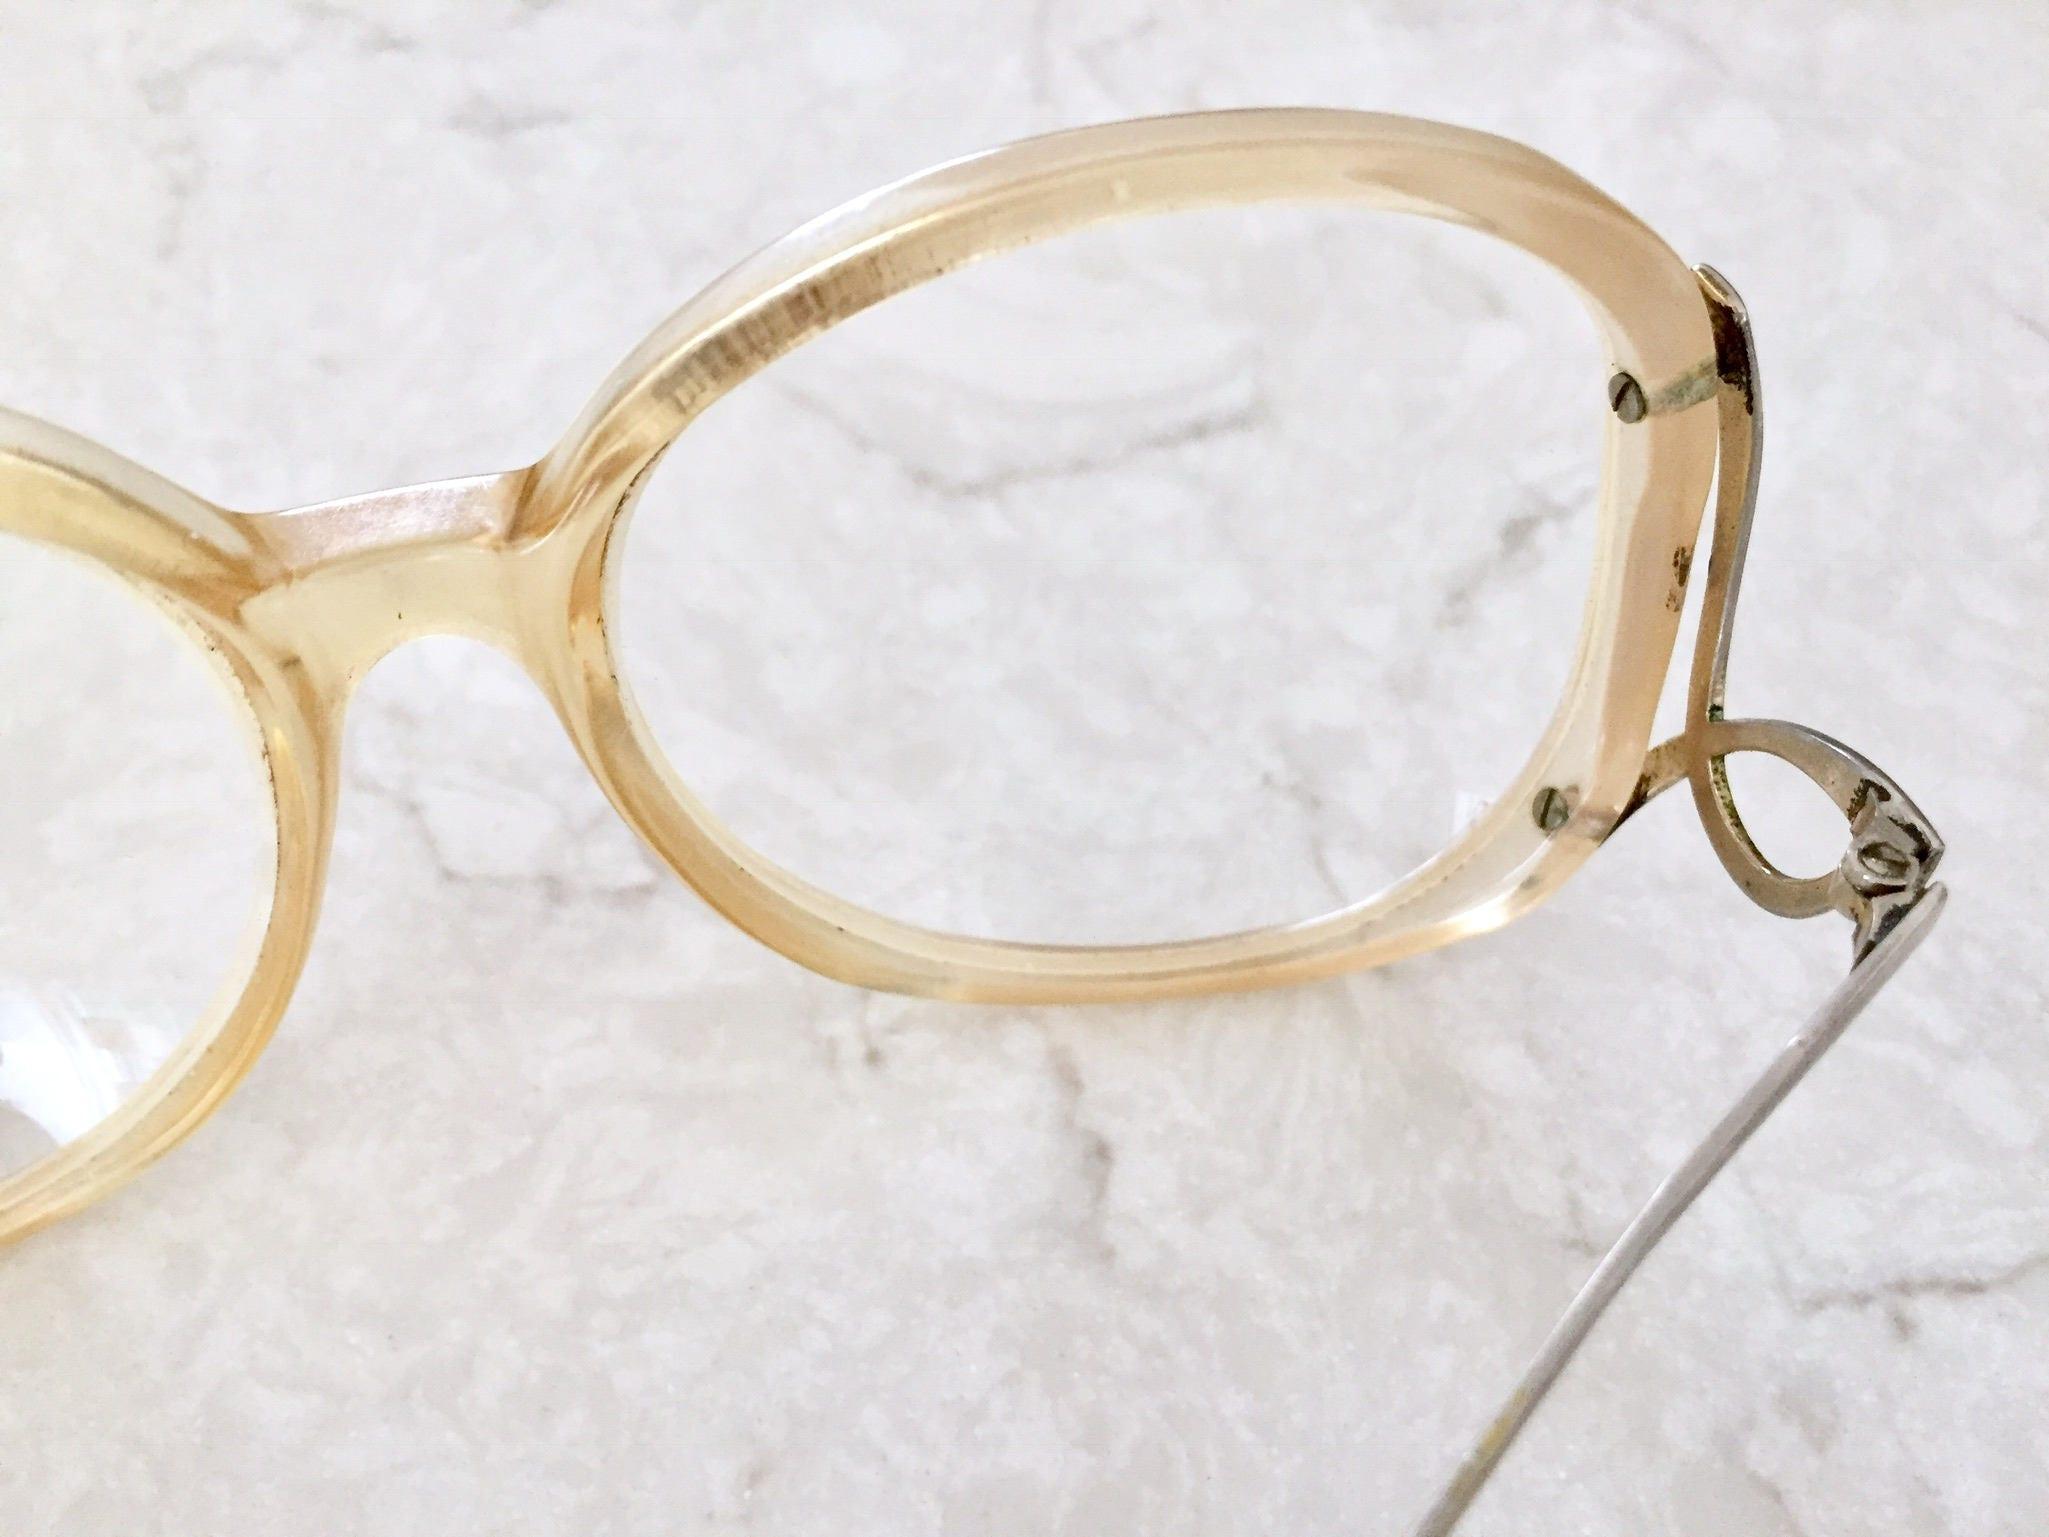 70s oversized eyeglass frames large two toned beige white frame drop arm eyeglasses oversized - White Frame Eyeglasses